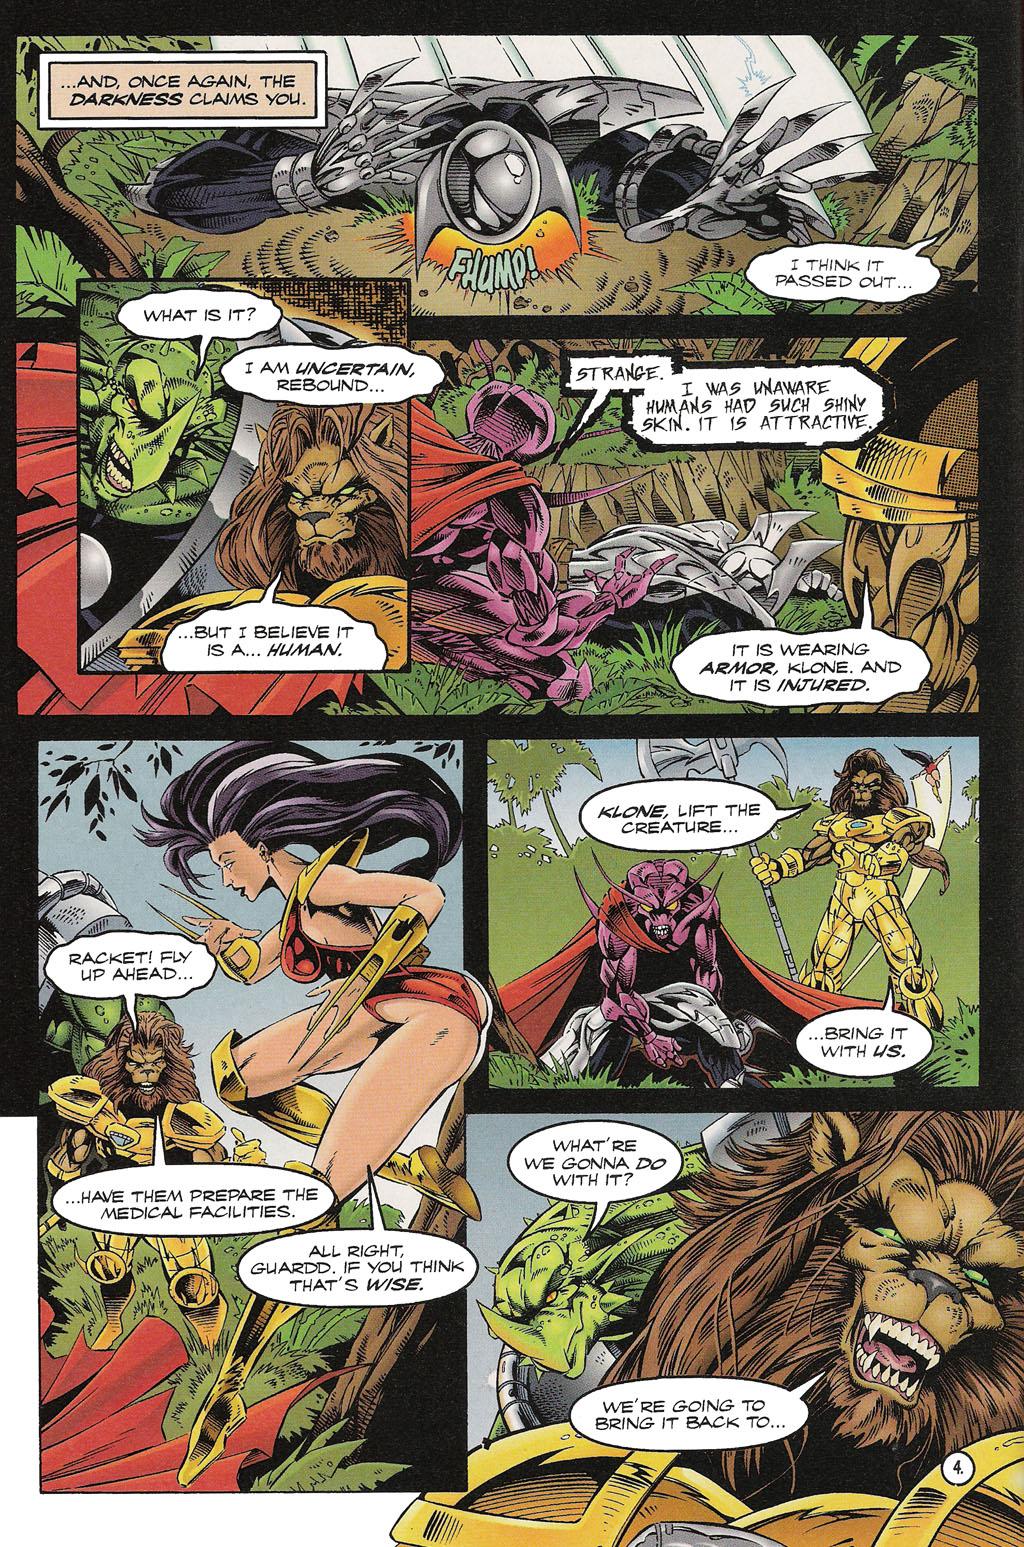 Read online ShadowHawk comic -  Issue #15 - 5